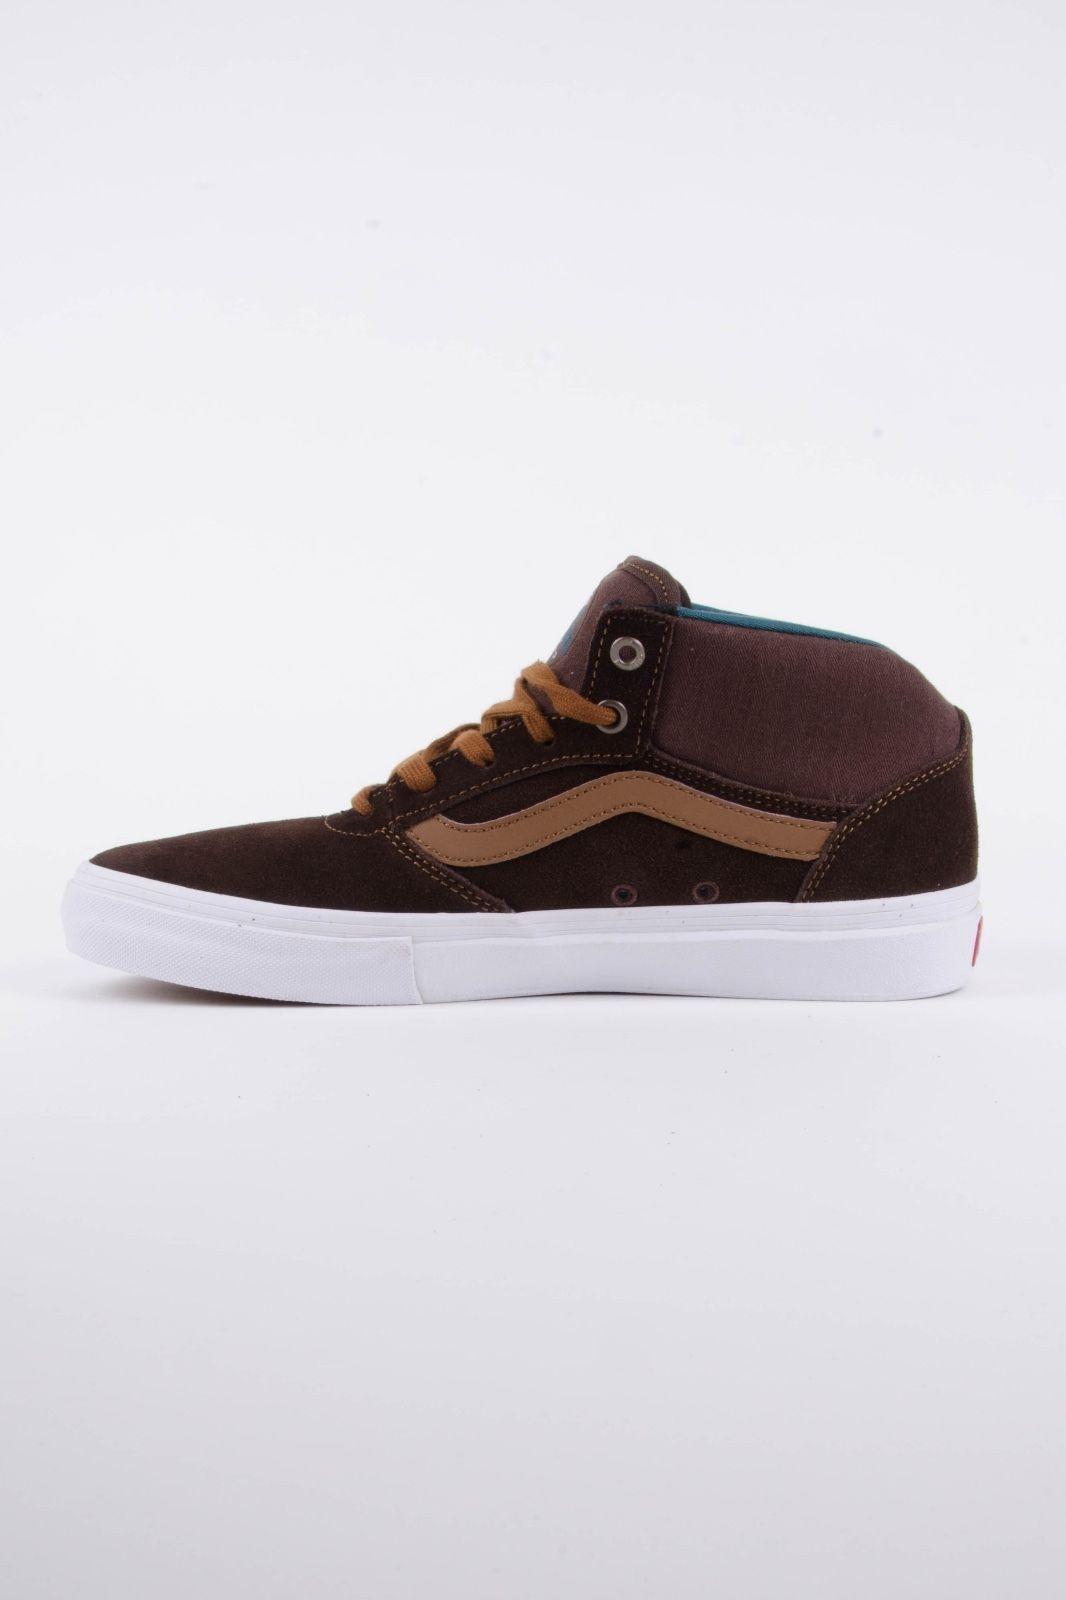 15f21f04812f Vans Gilbert Crockett Pro MID DEMITASSE Men s Classic Skate Shoes Size 7 NEW